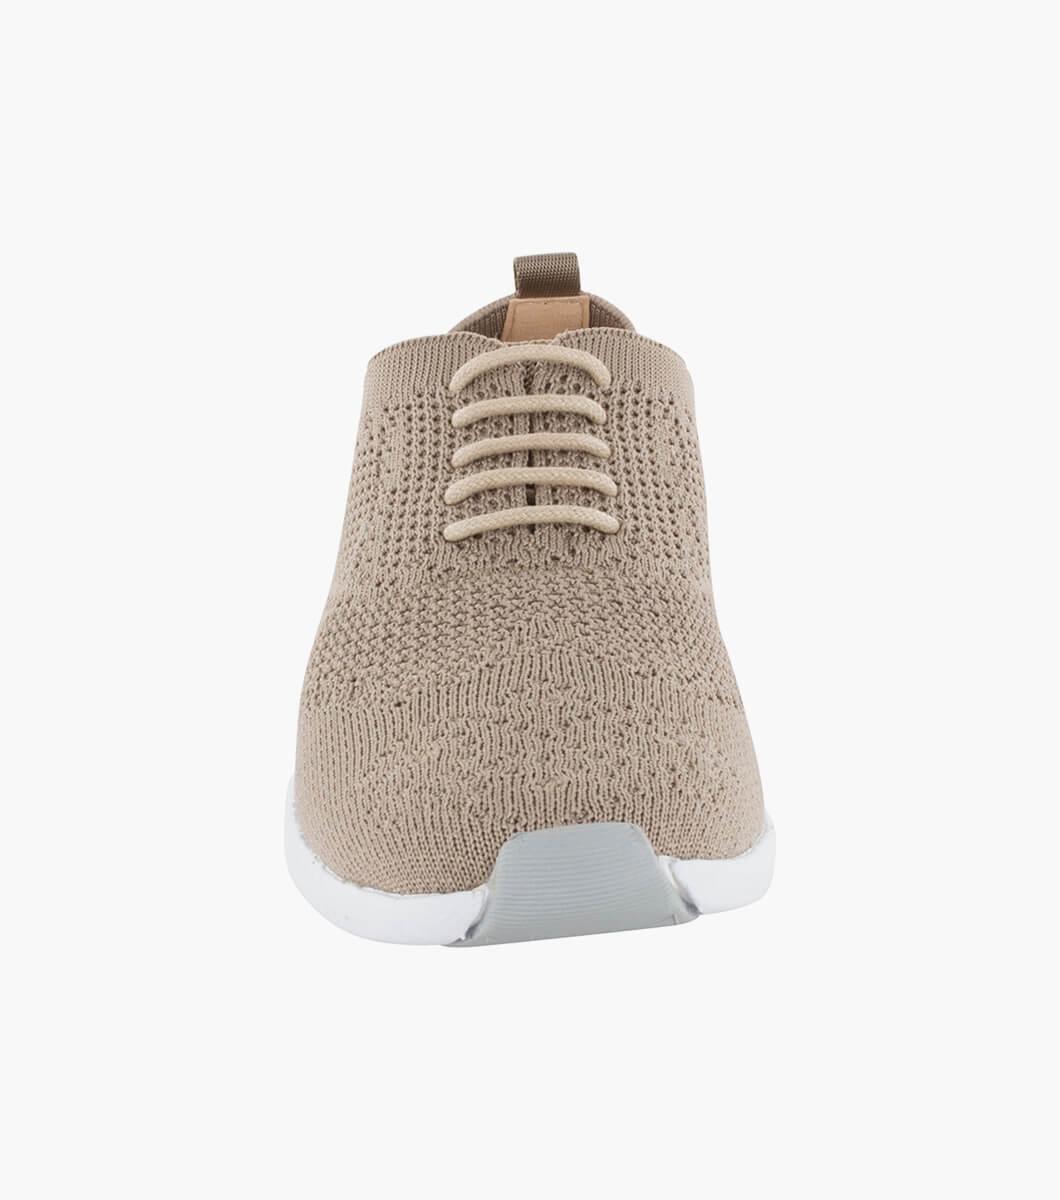 thumbnail 21 - Brand New Women's Florsheim Nina Sneakers